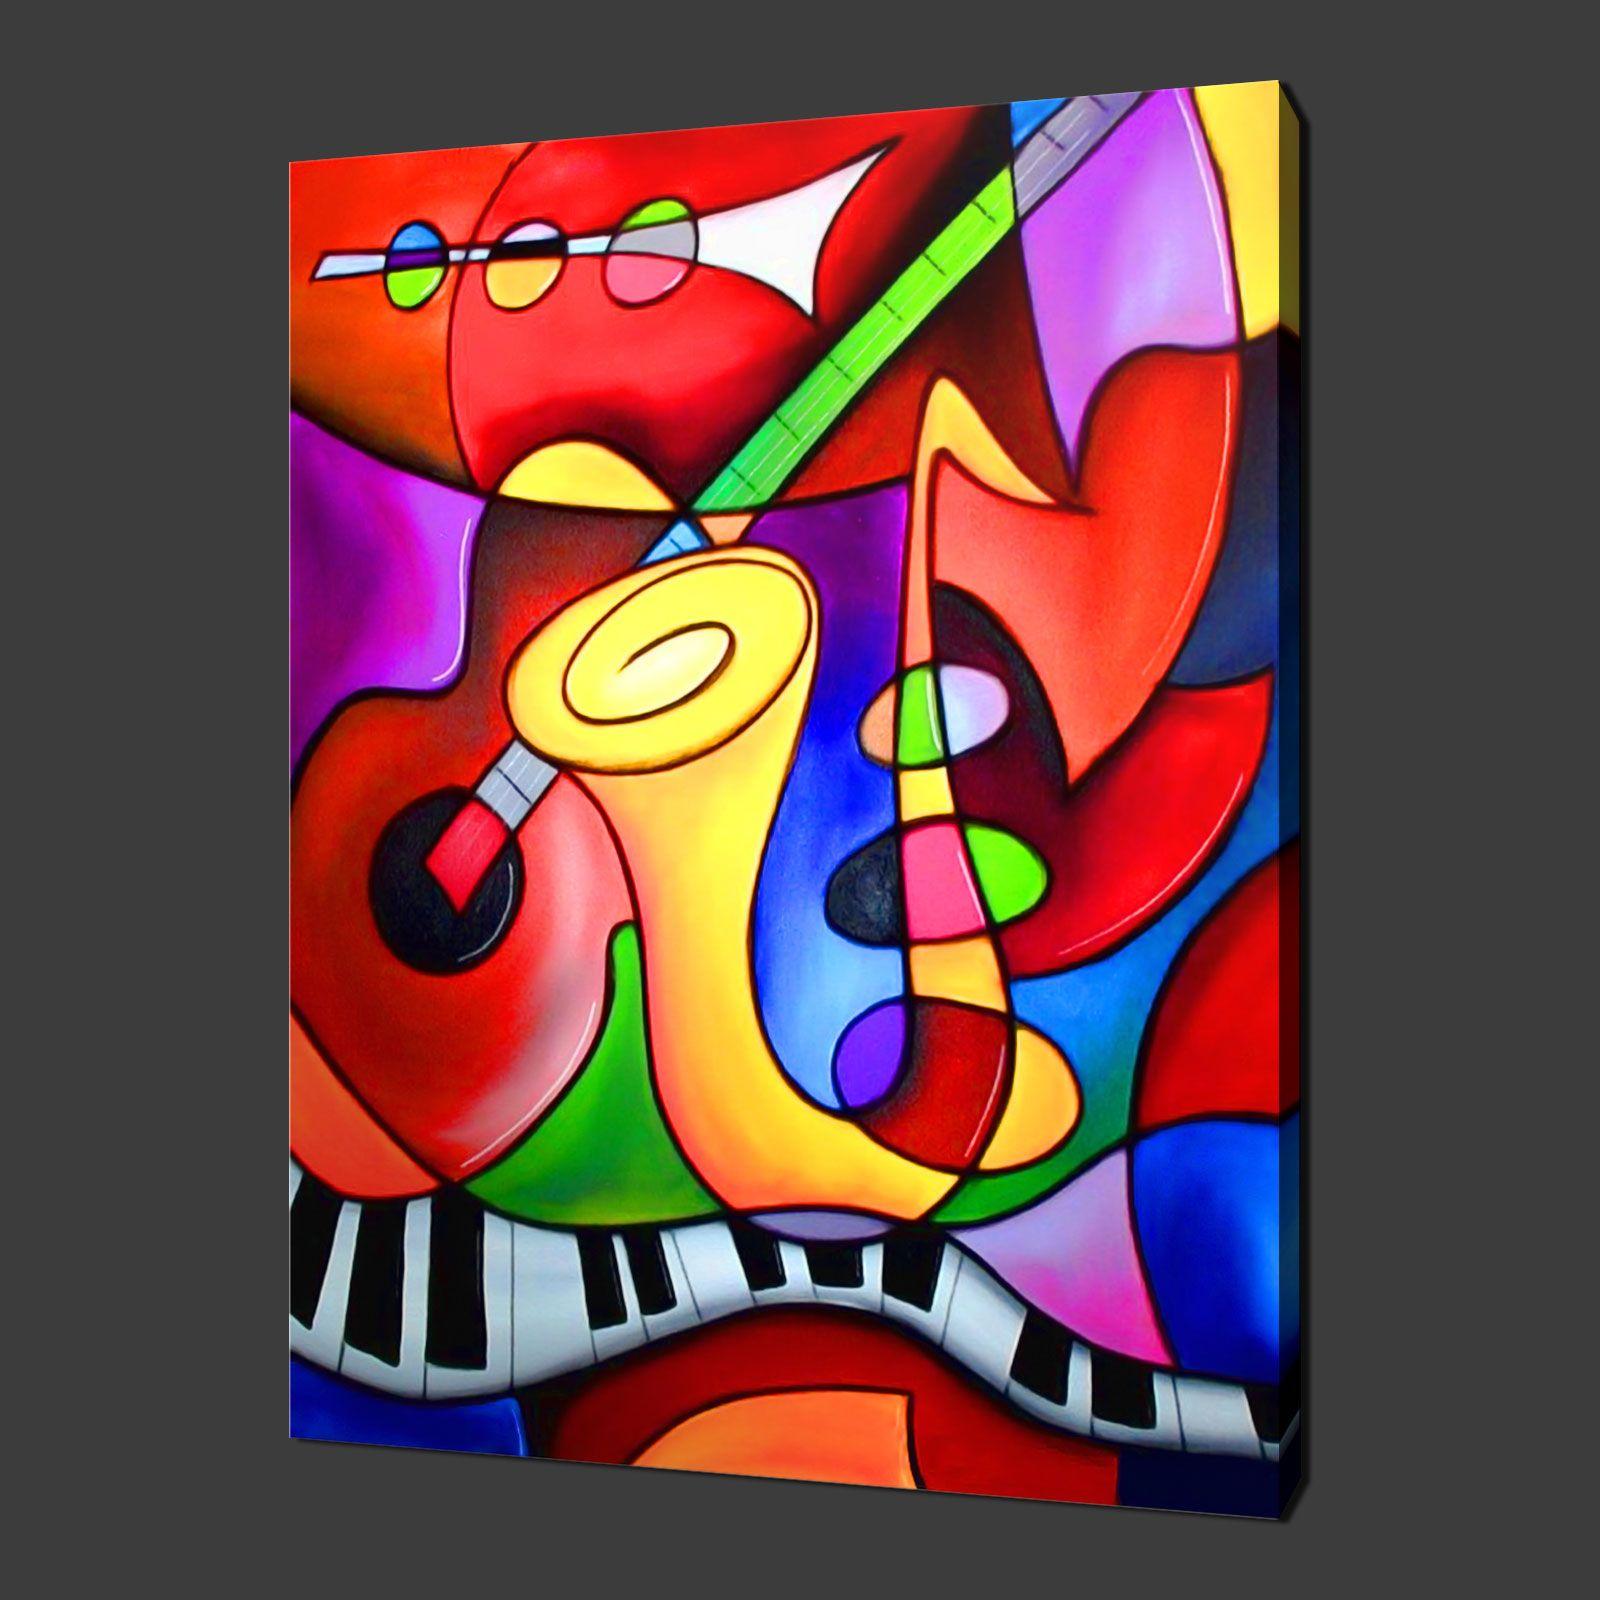 Abstract Painting Premium Canvas Print Wall Art Modern Design Free Uk P P Soyut Yagliboya Soyut Tuval Mozaic Sanati